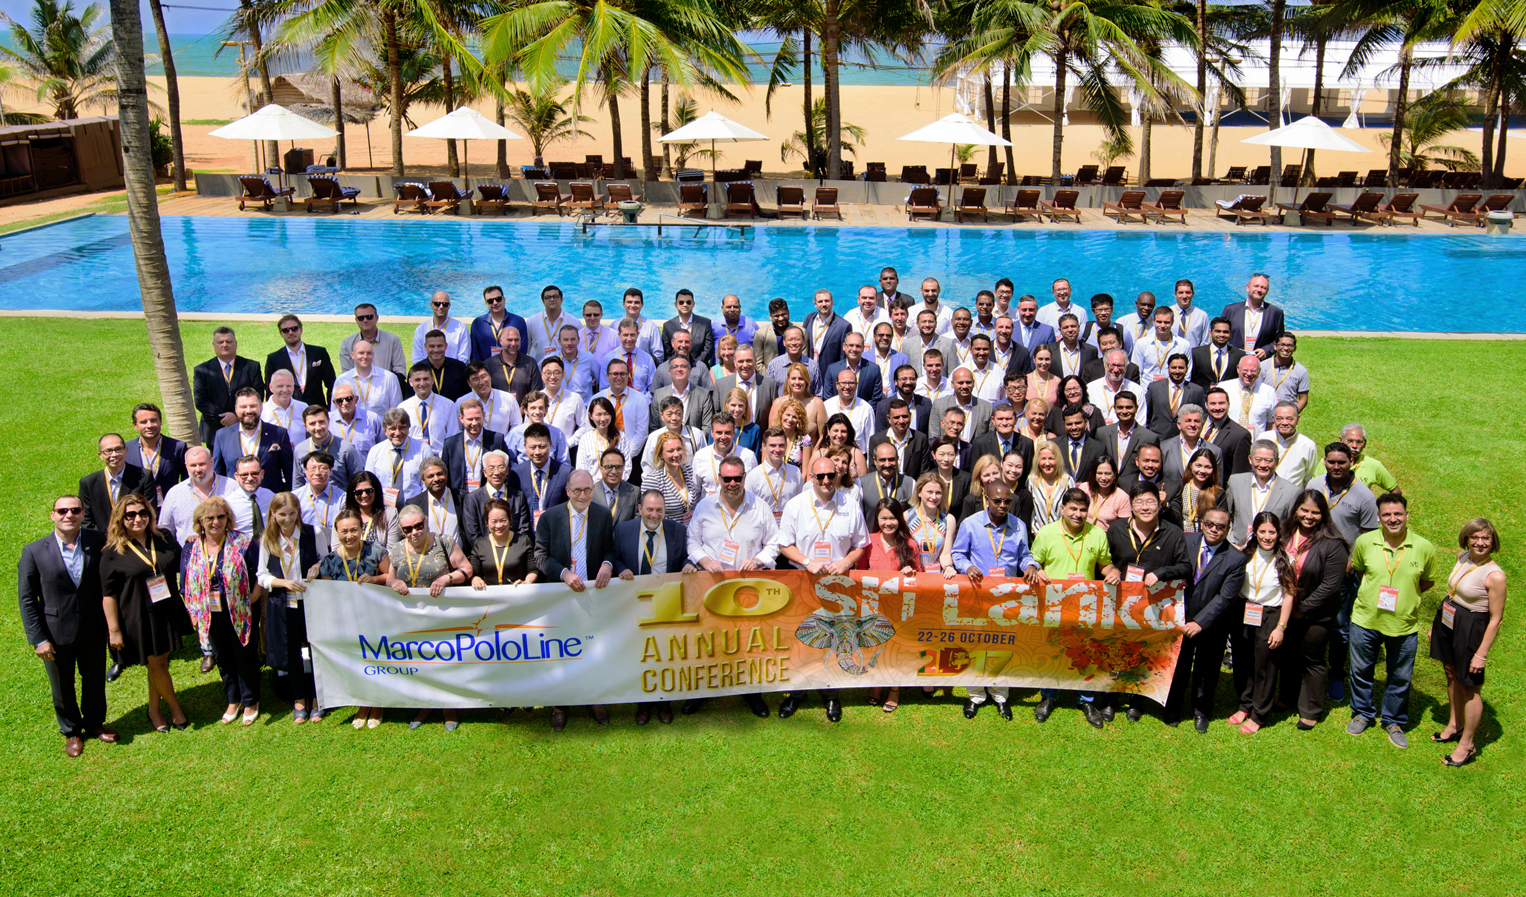 MPL_Conference Sri Lanka 2017